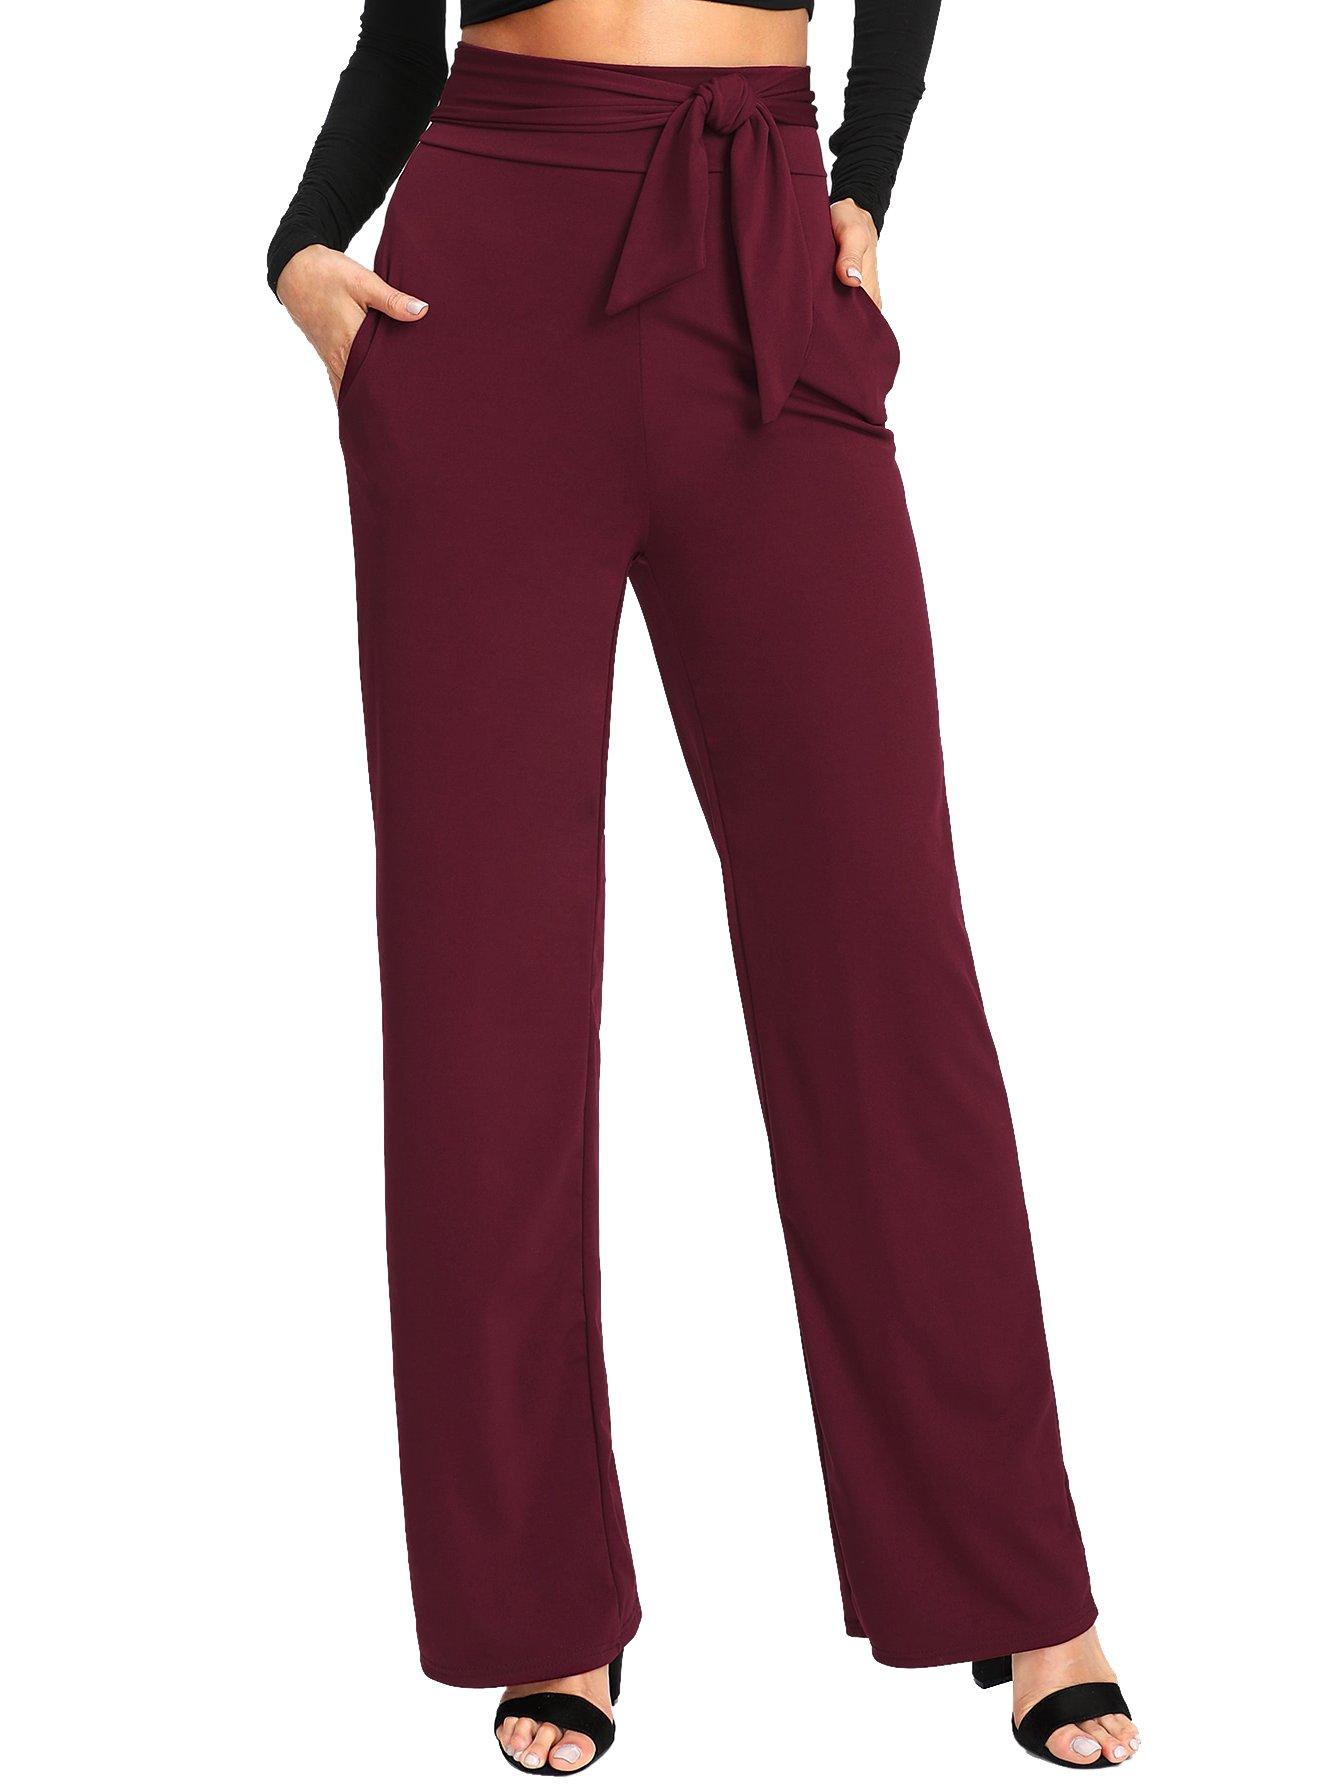 SheIn Women's Casual Stretchy High Waist Wide Leg Dress Pants Tie Burgundy Large